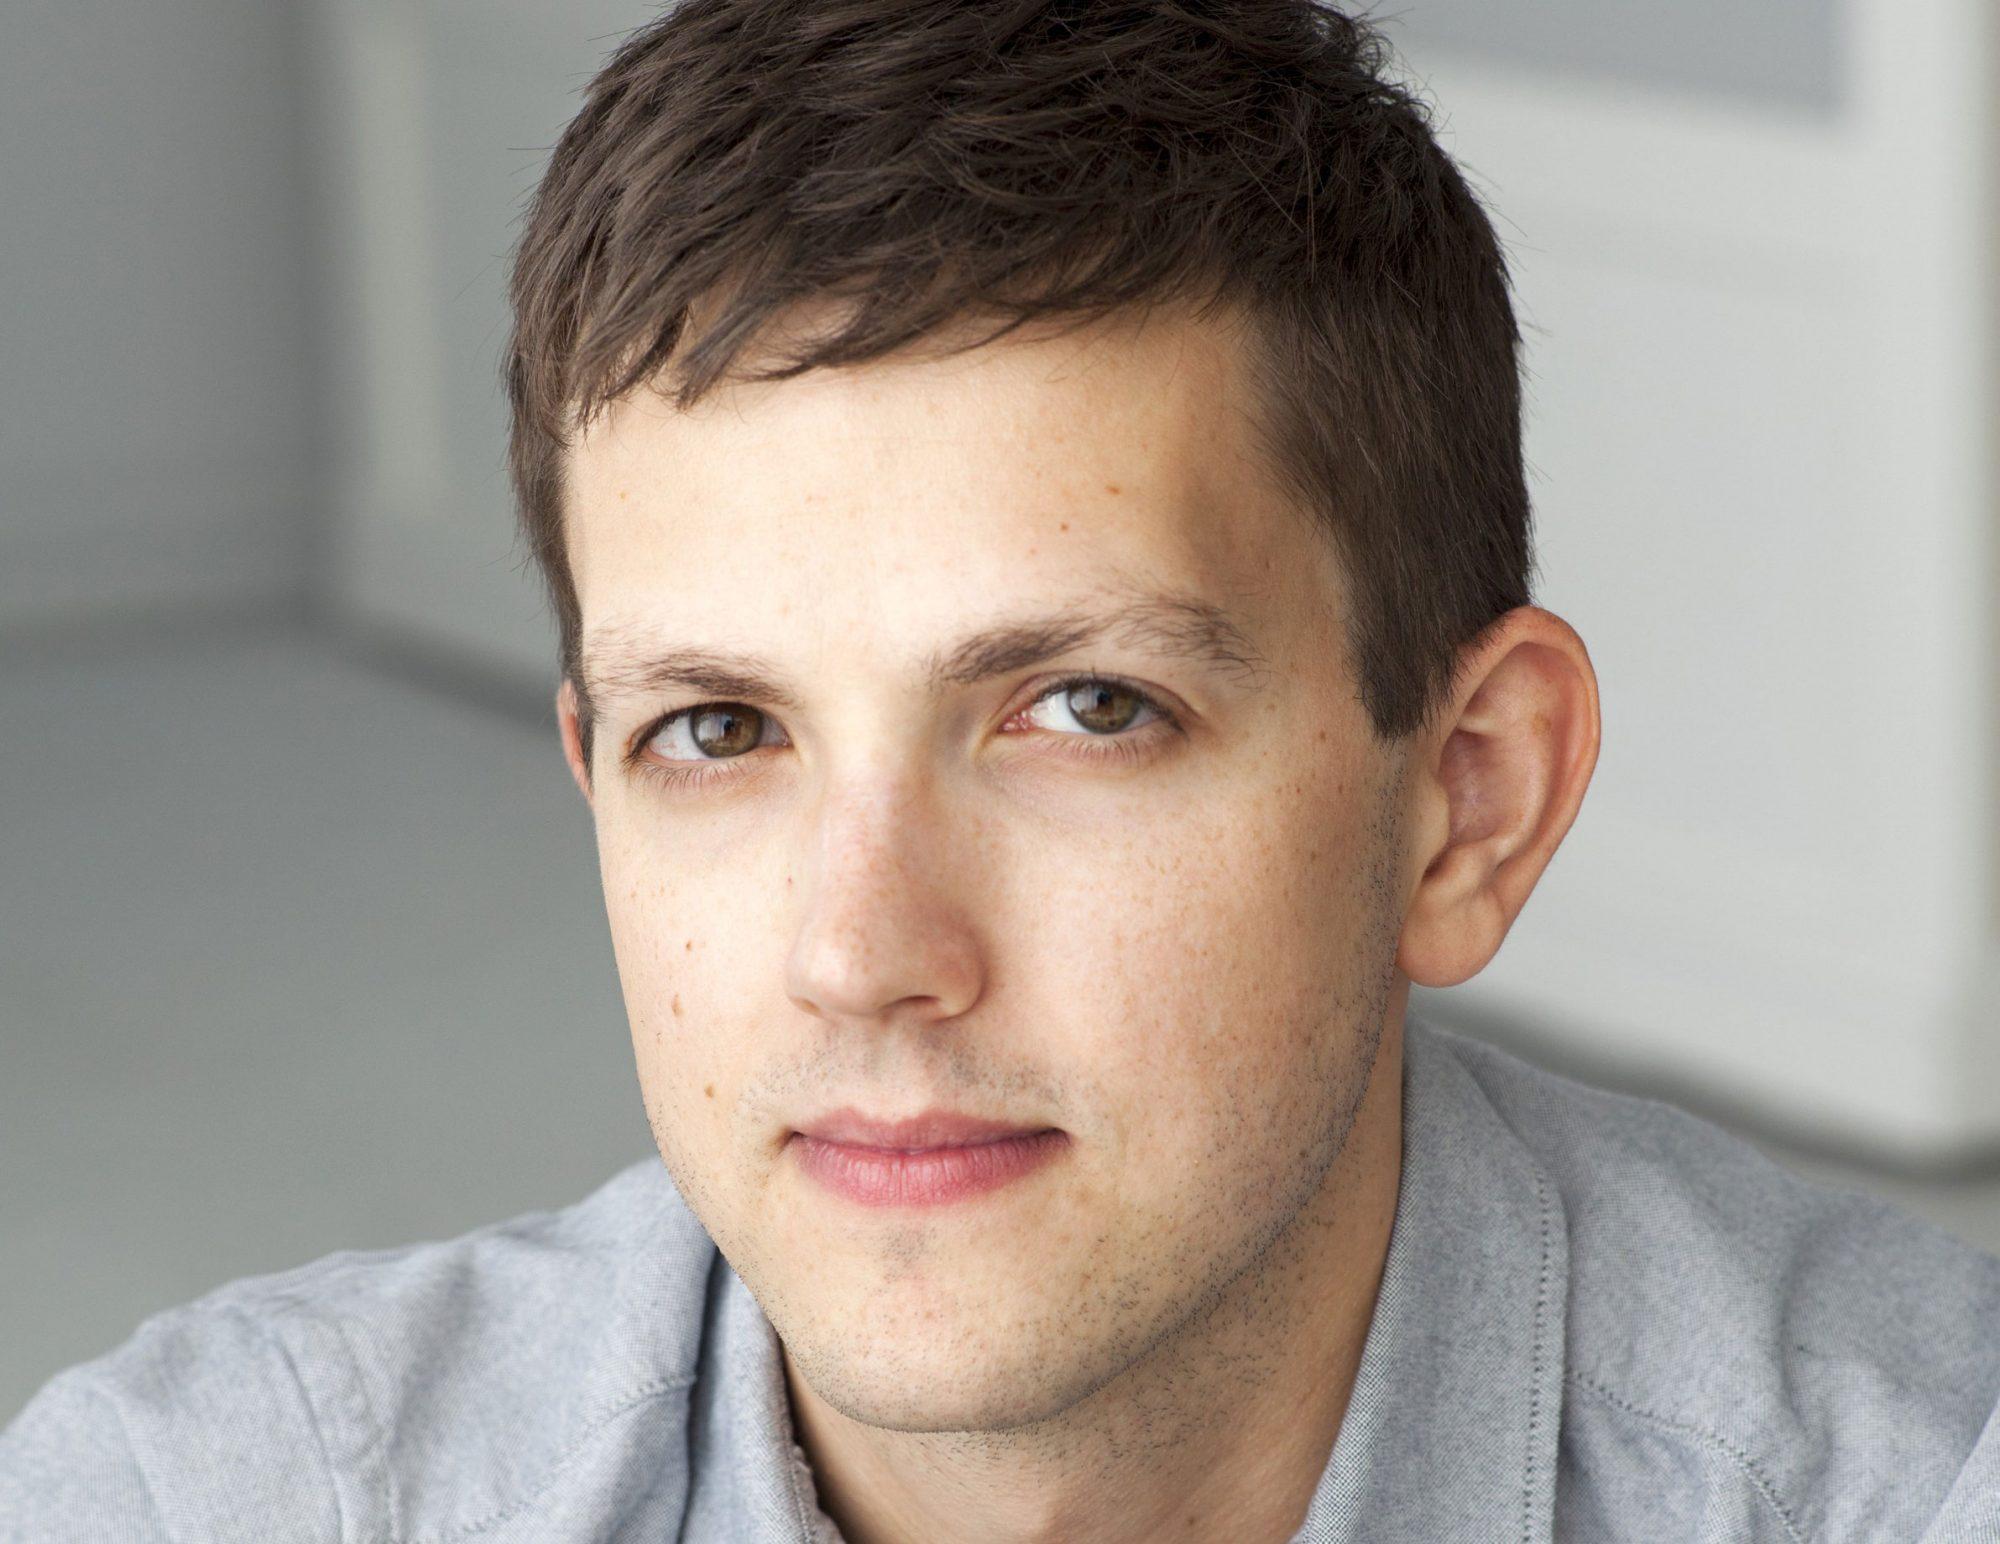 EC: How 'Stephen Florida' Author Gabe Habash Does Breakfast